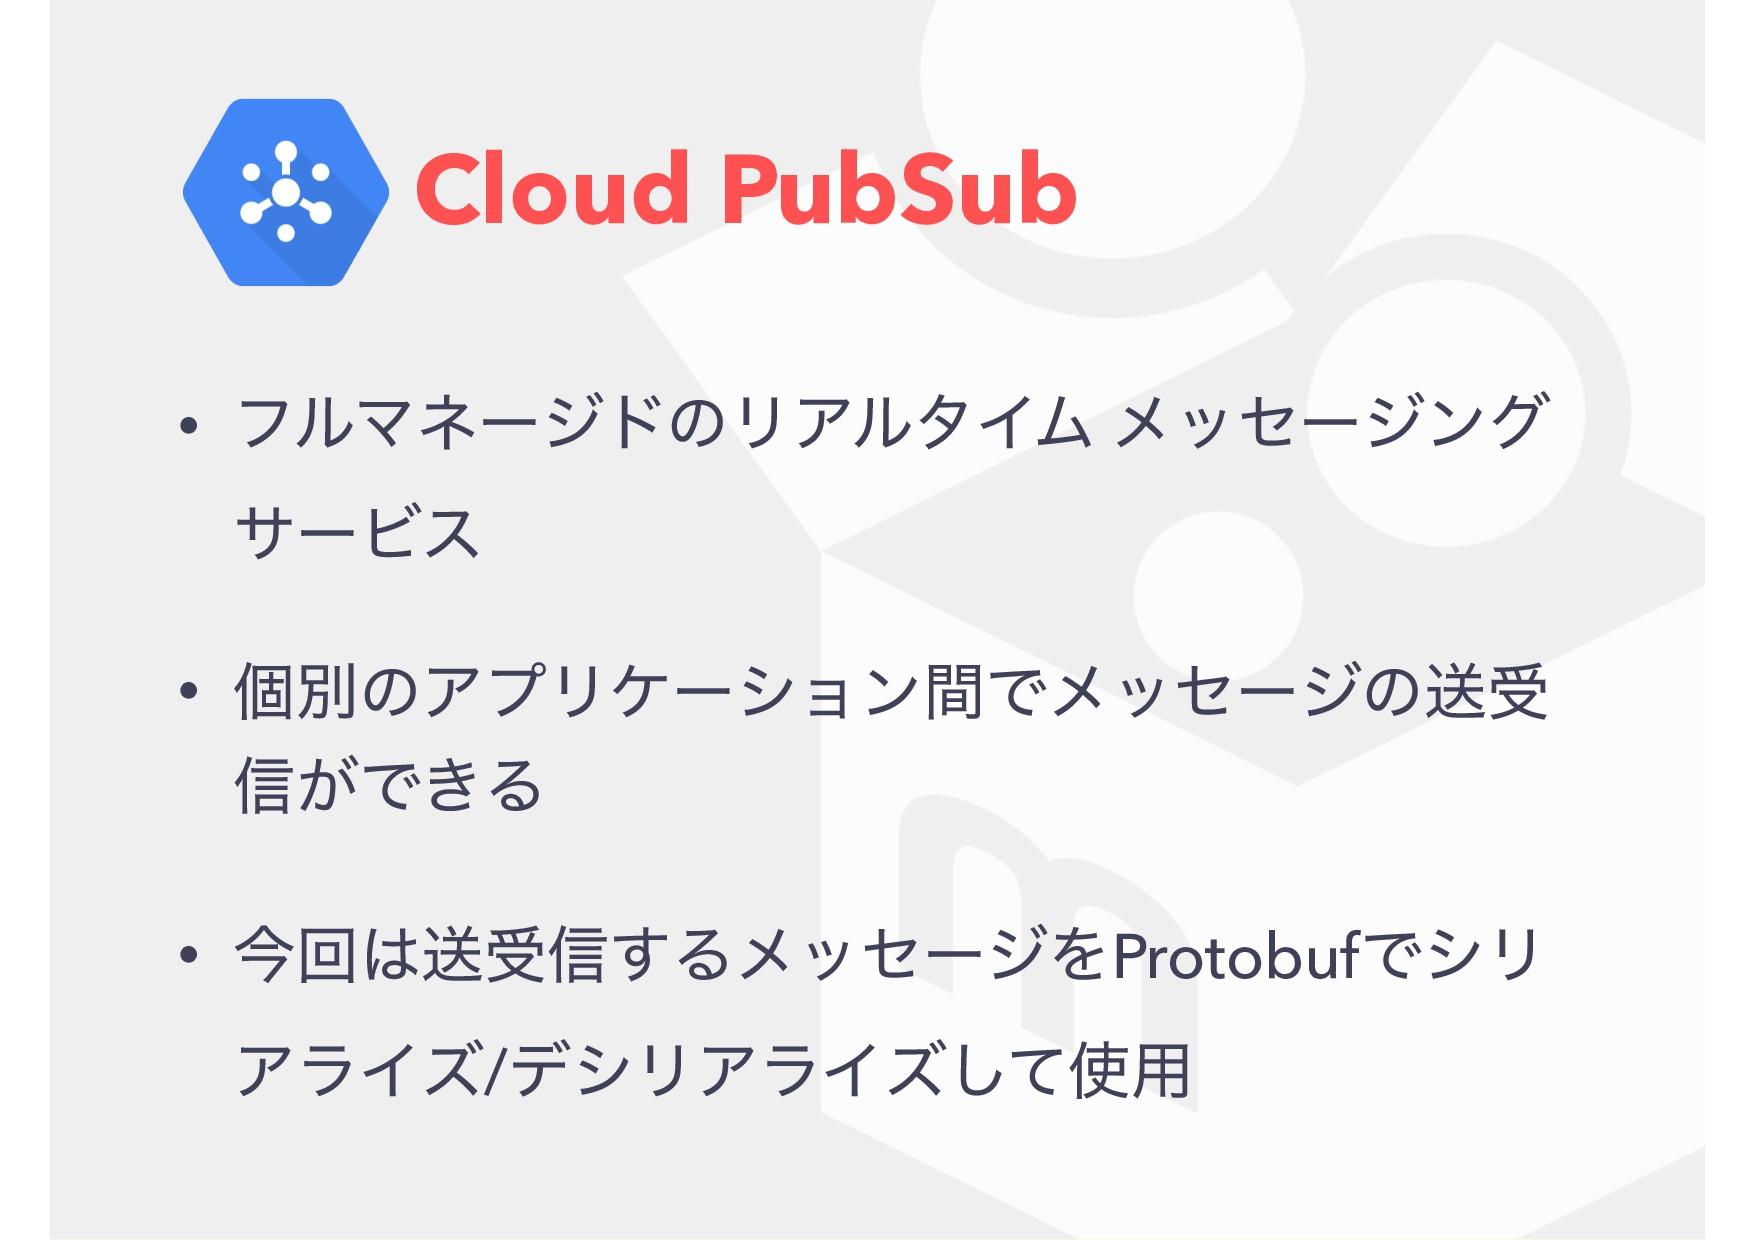 Cloud PubSub • ϑϧϚωʔδυͷϦΞϧλΠϜ ϝοηʔδϯά αʔϏε • ݸผ...